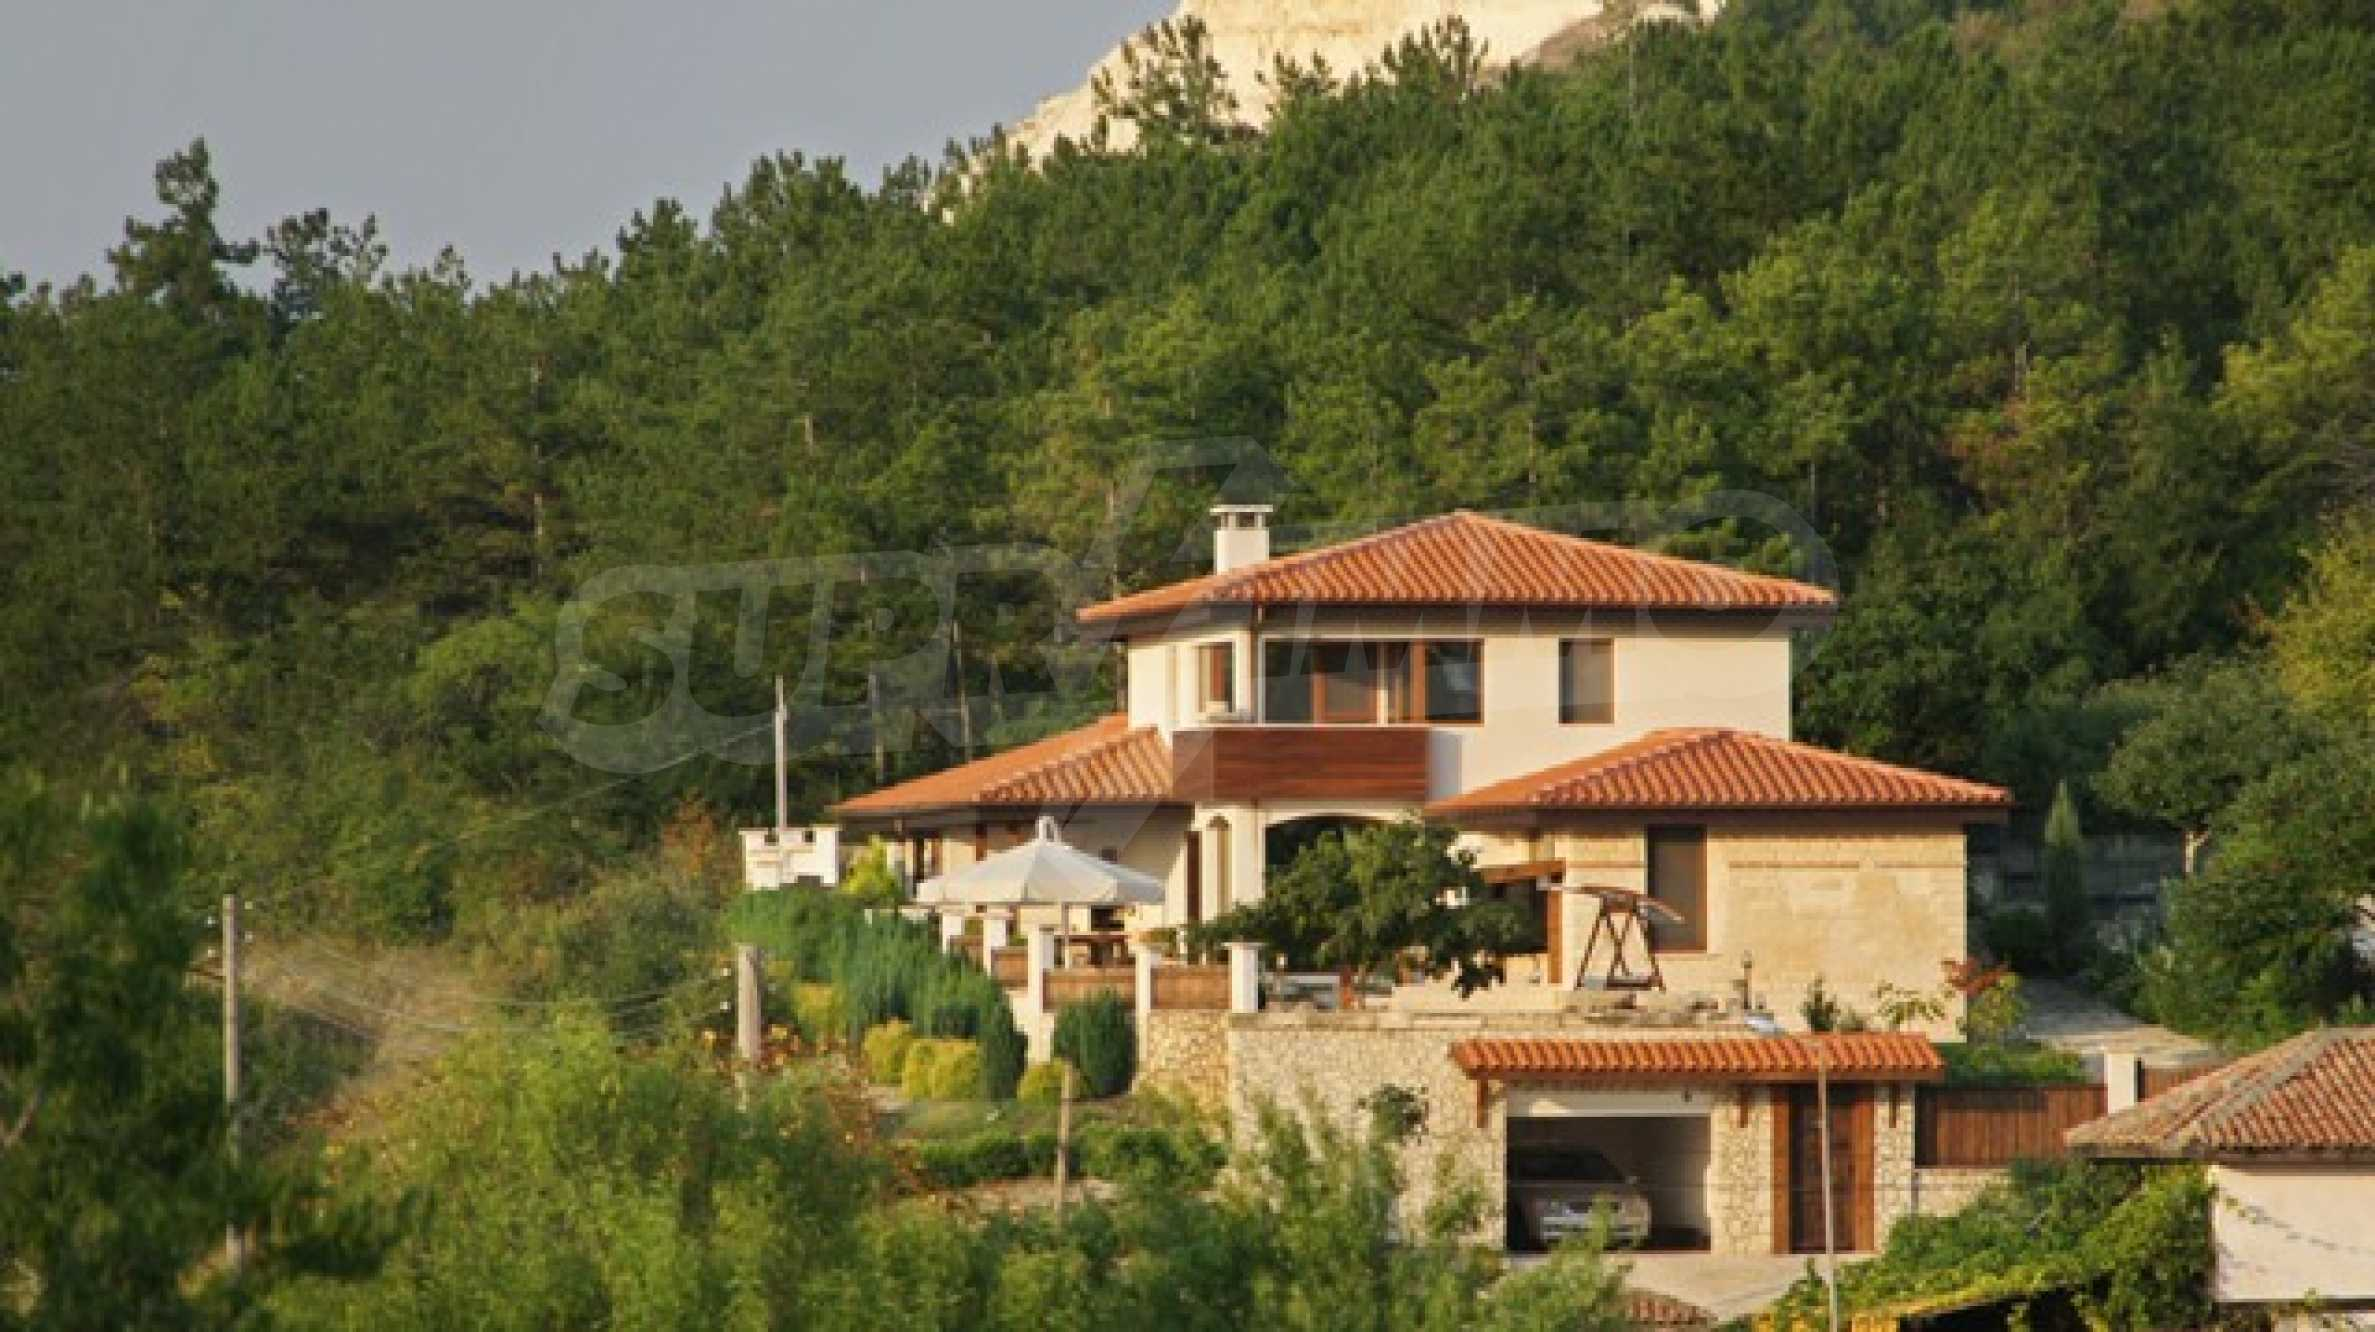 The Mediterranean style - a sense of luxury 5